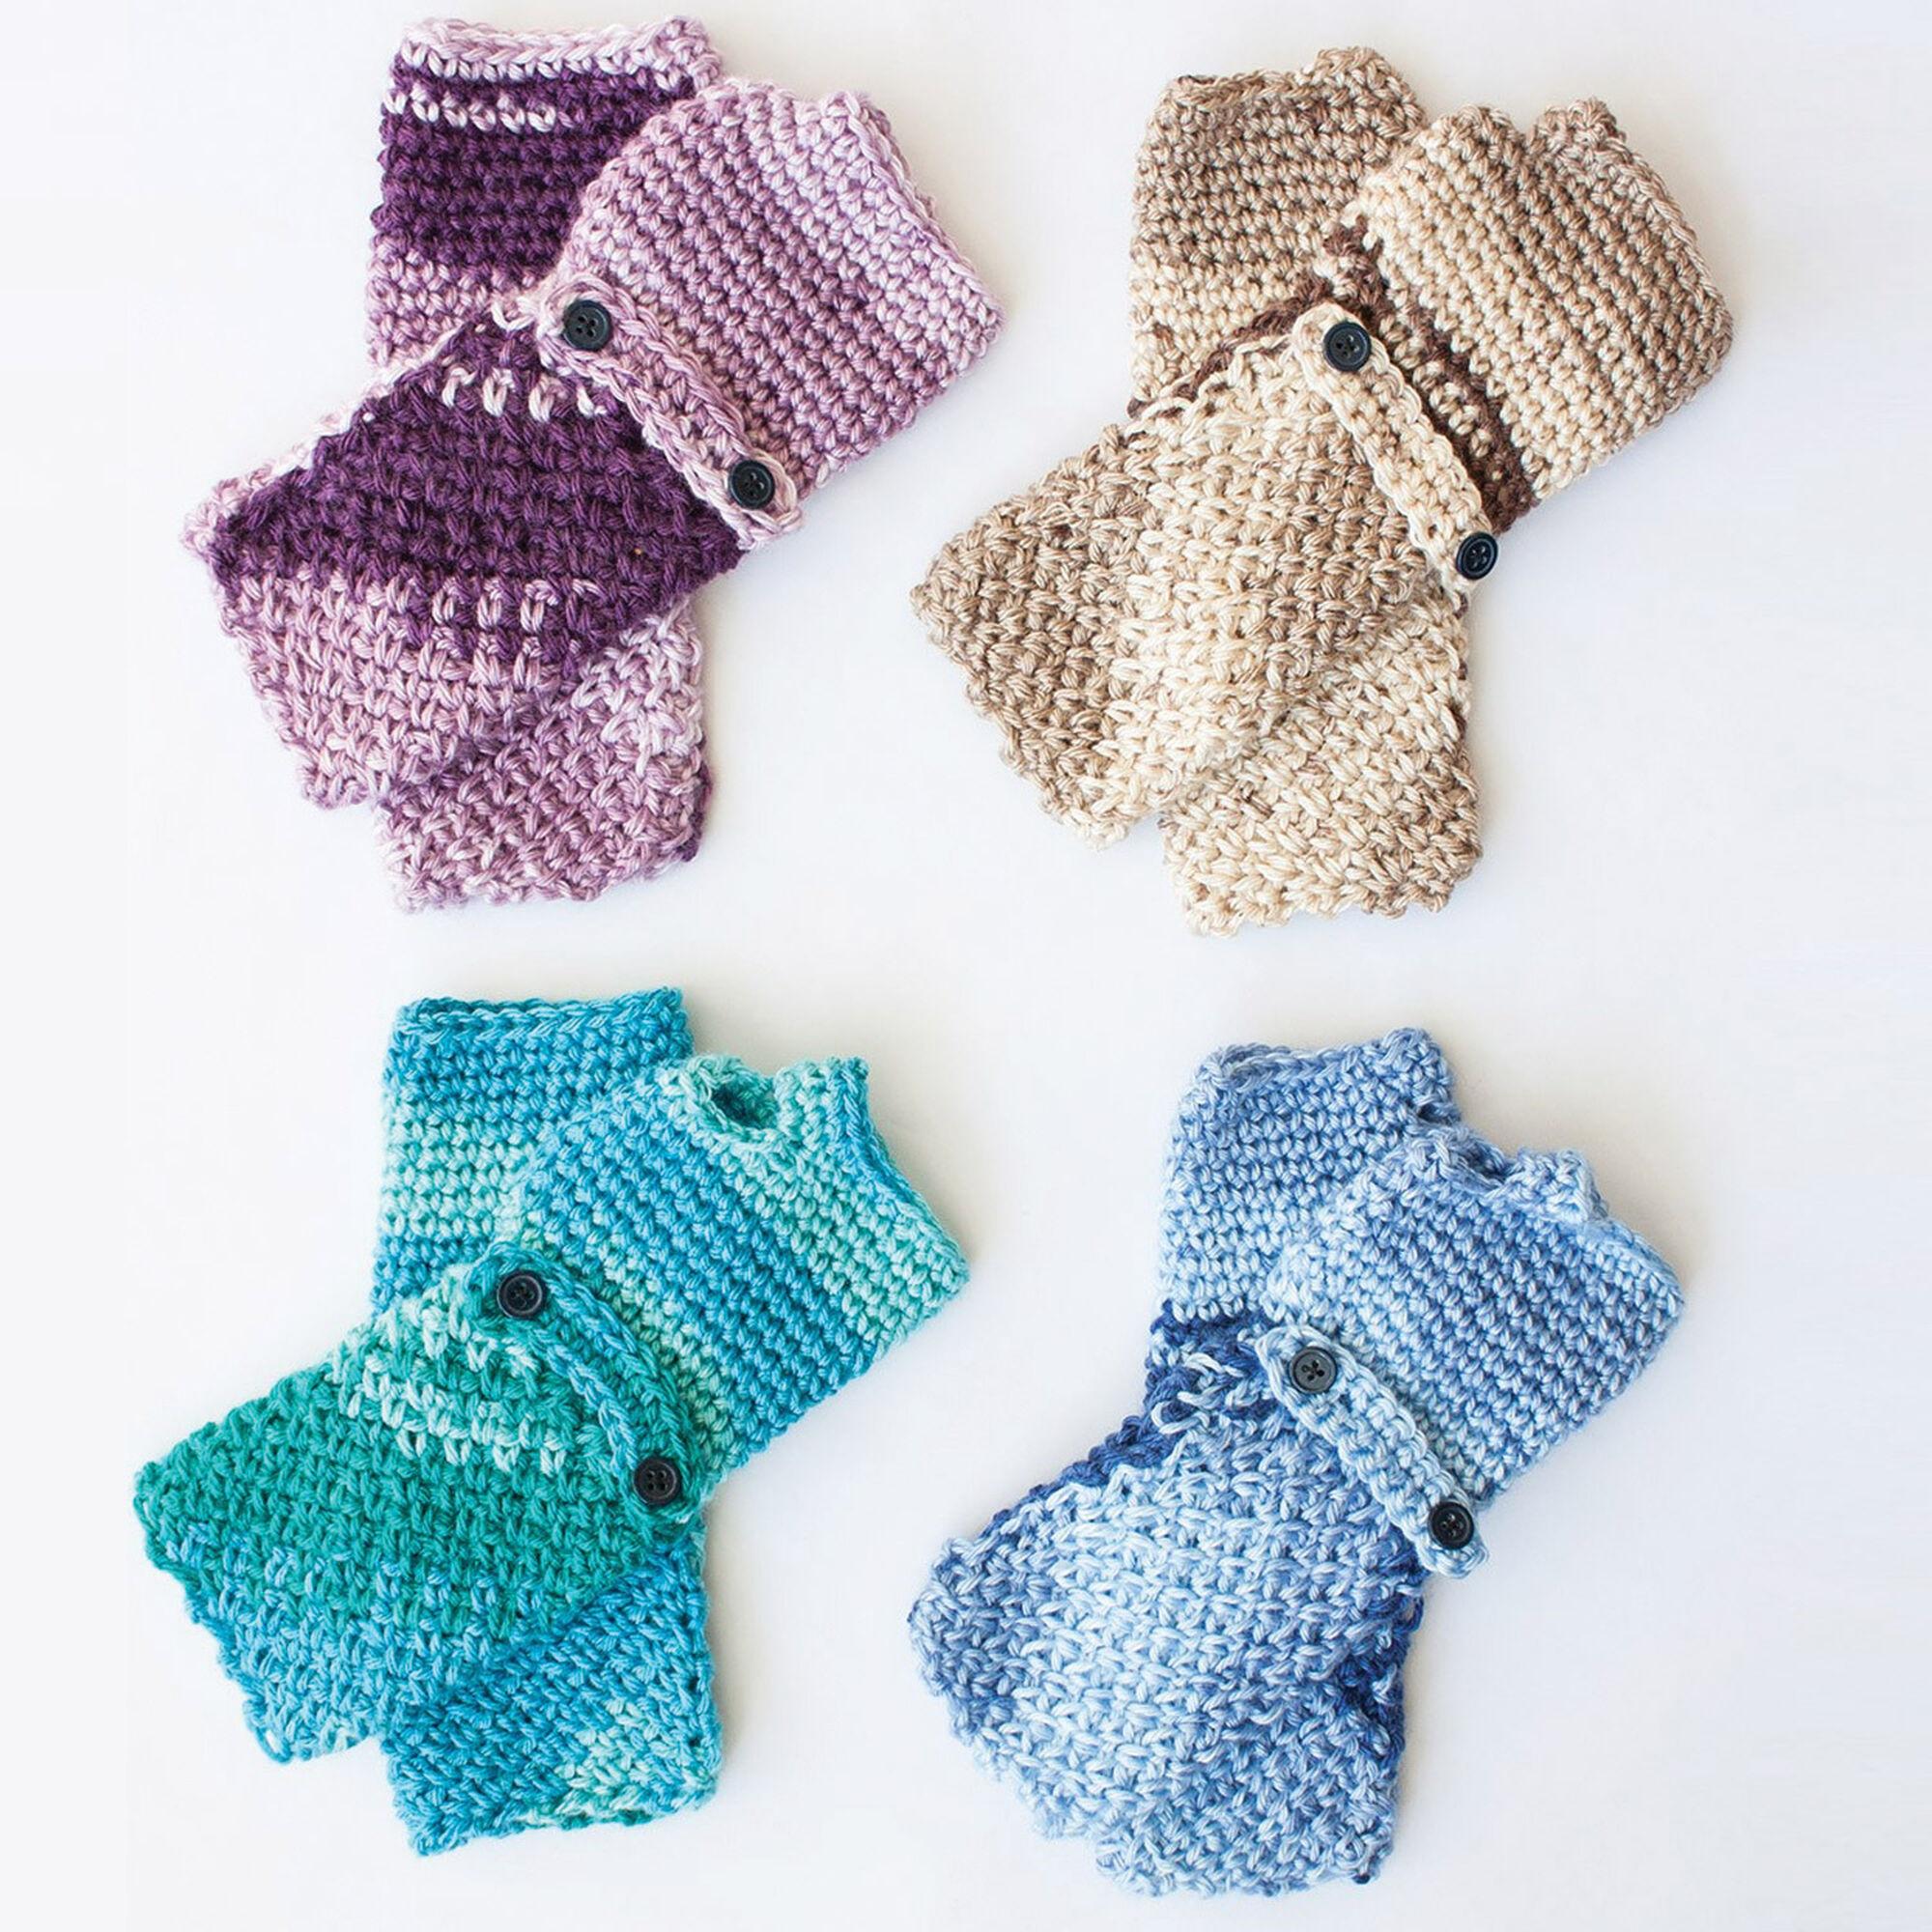 Caron Cozy Posy Fingerless Gloves, Saturday Blue Jeans   Yarnspirations